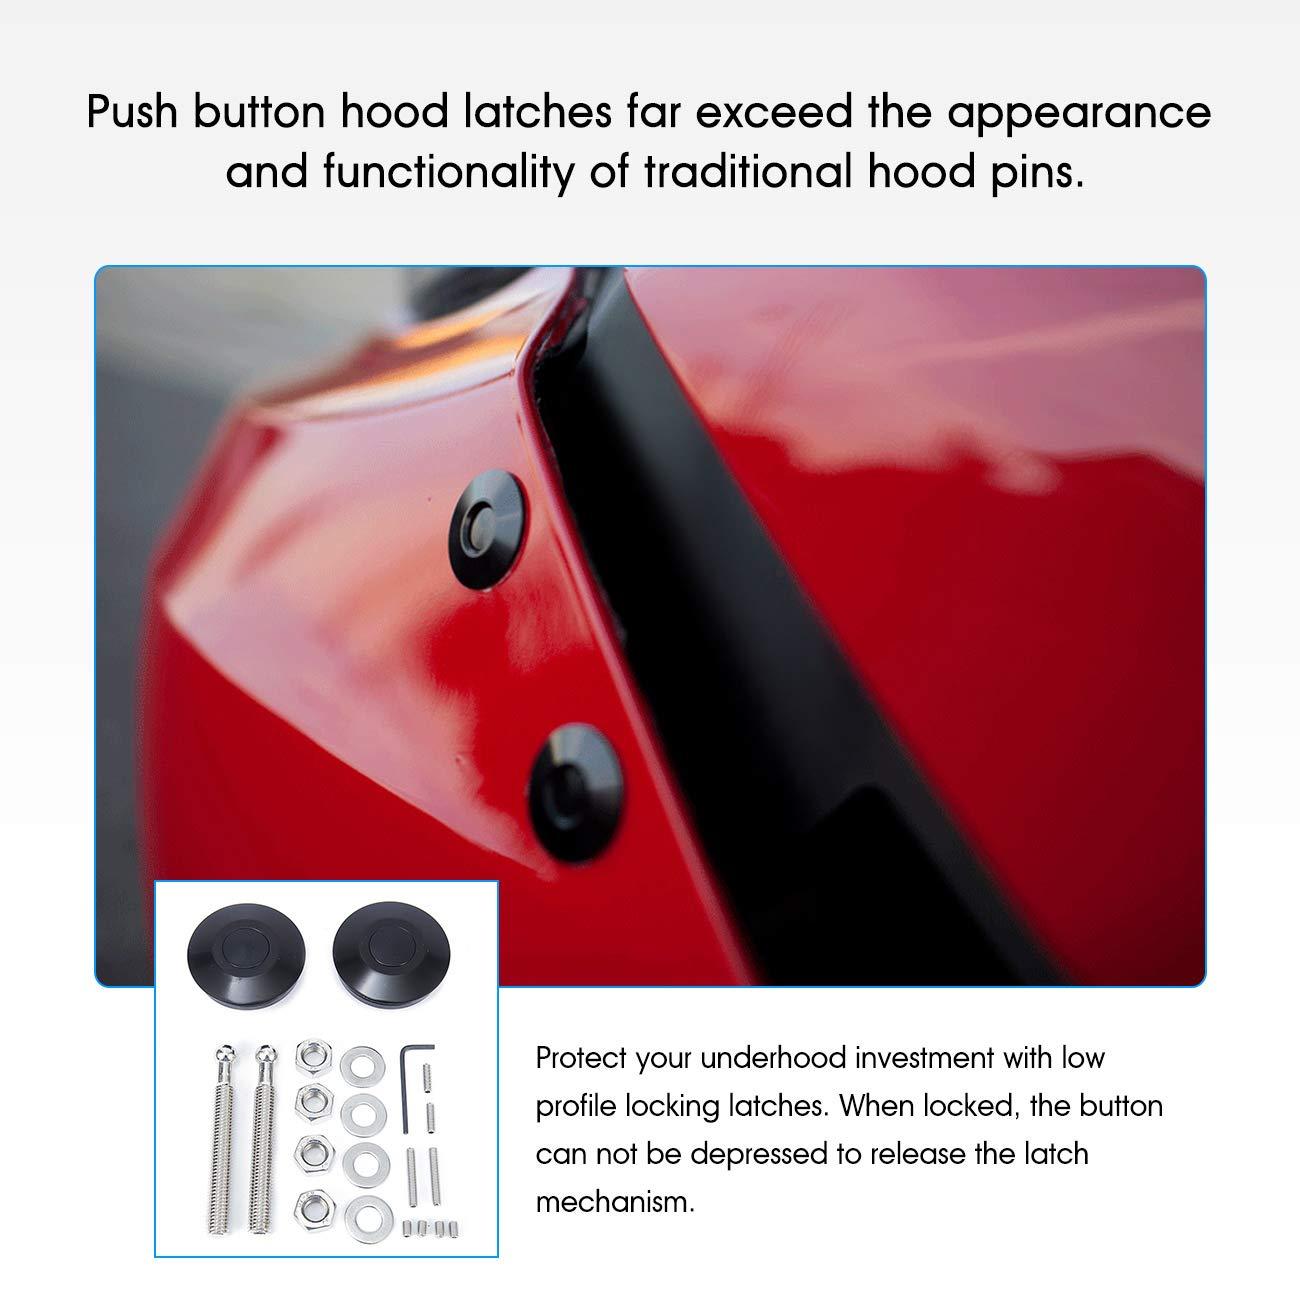 1 Pair, Black Partol Quick Latch Hood Pins Universal Heavy Duty Bumper Hood Latch Low Profile Hood Pins Latch Lock Clip Kit Quick Release Latch 62mm//2.44 for Mostly Car or DIY